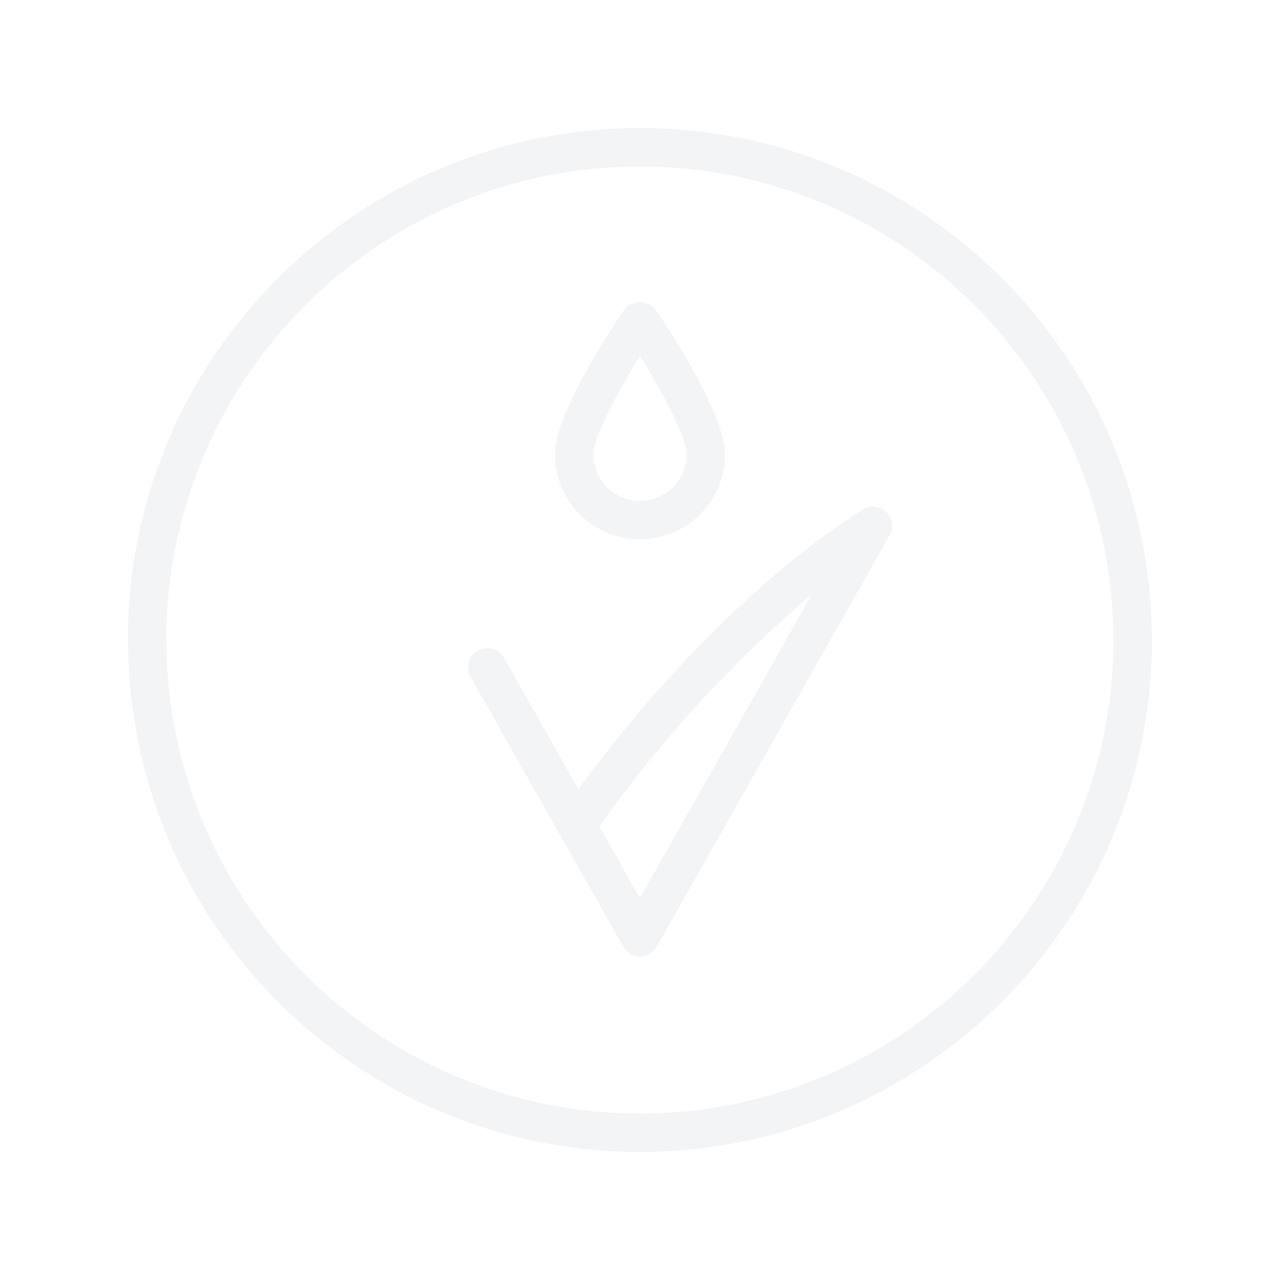 MEXX Forever Classic Never Boring For Her EDP 15ml